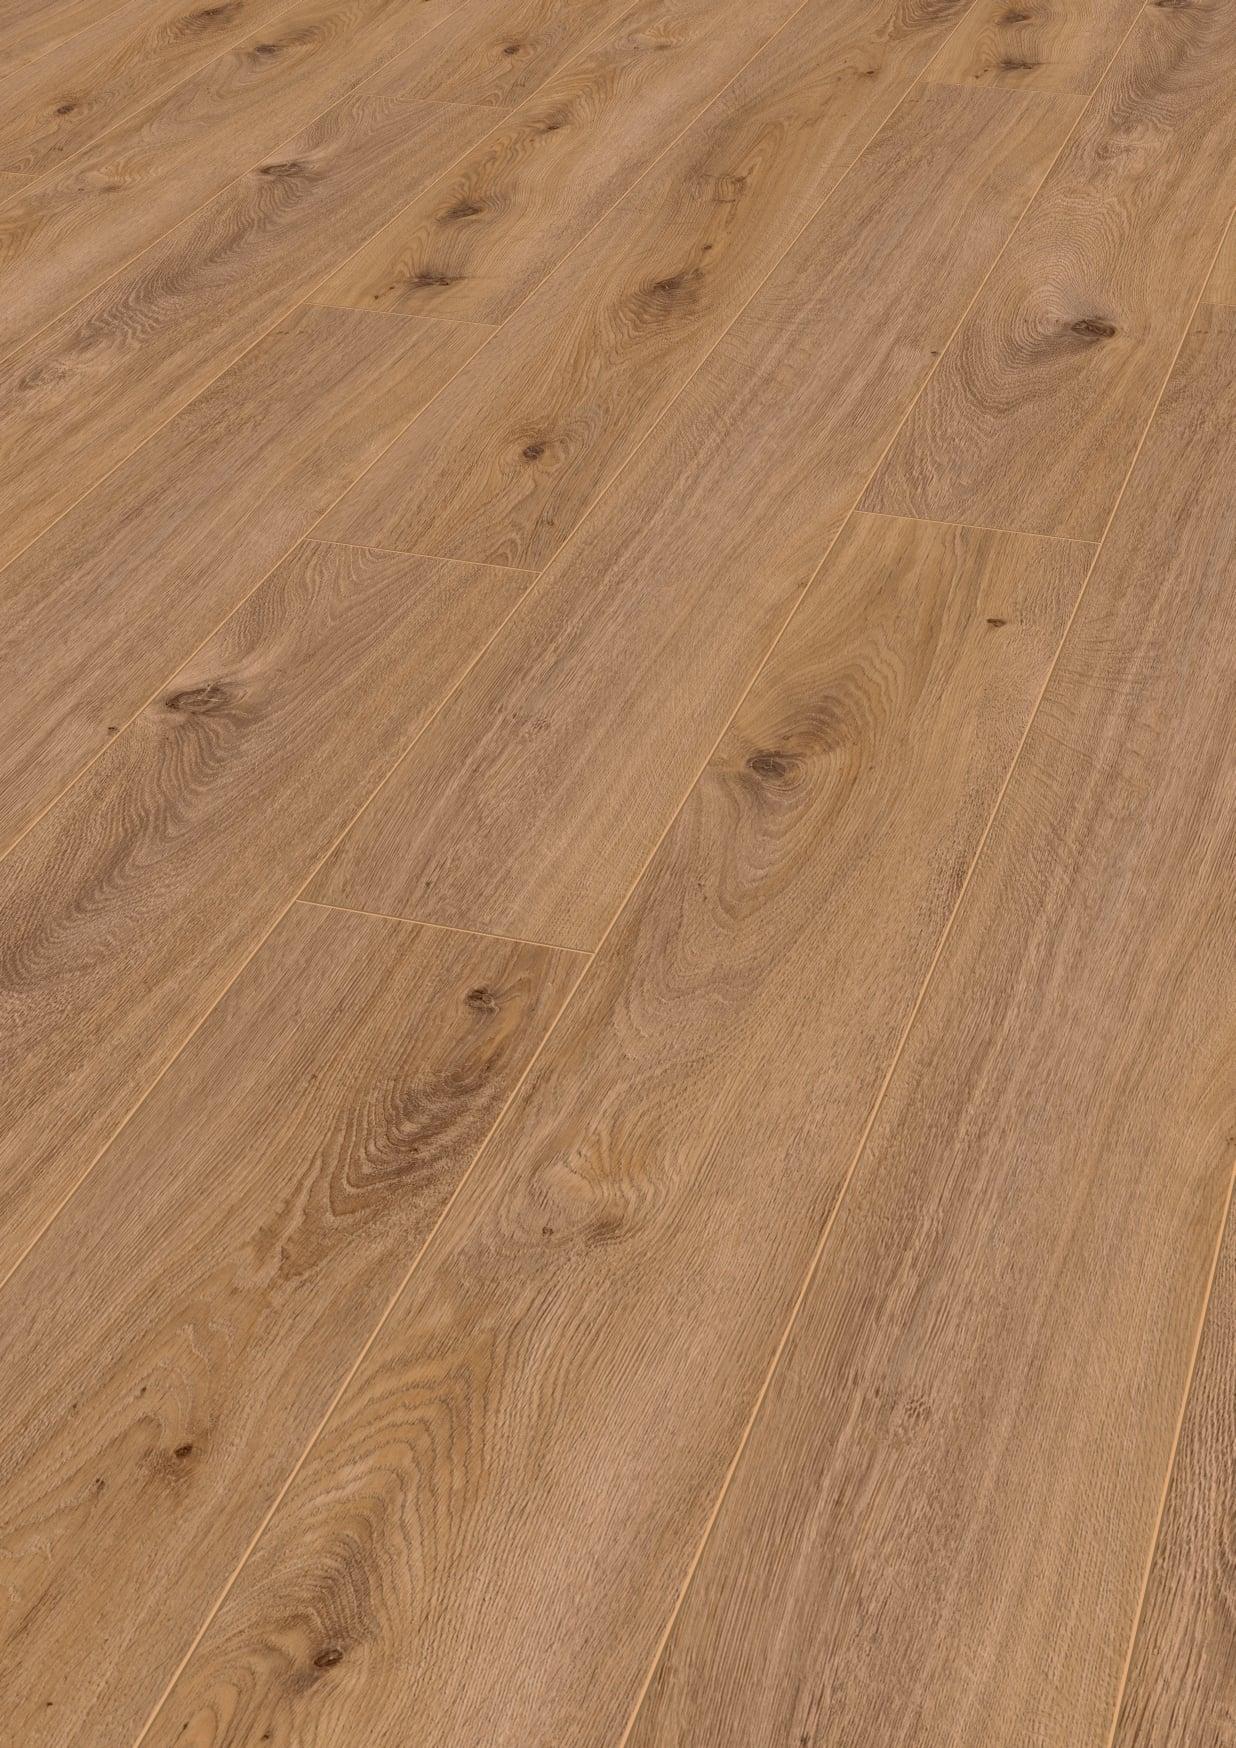 Kronotex amazon prestige oak light aa floors toronto for Kronotex oak laminate flooring